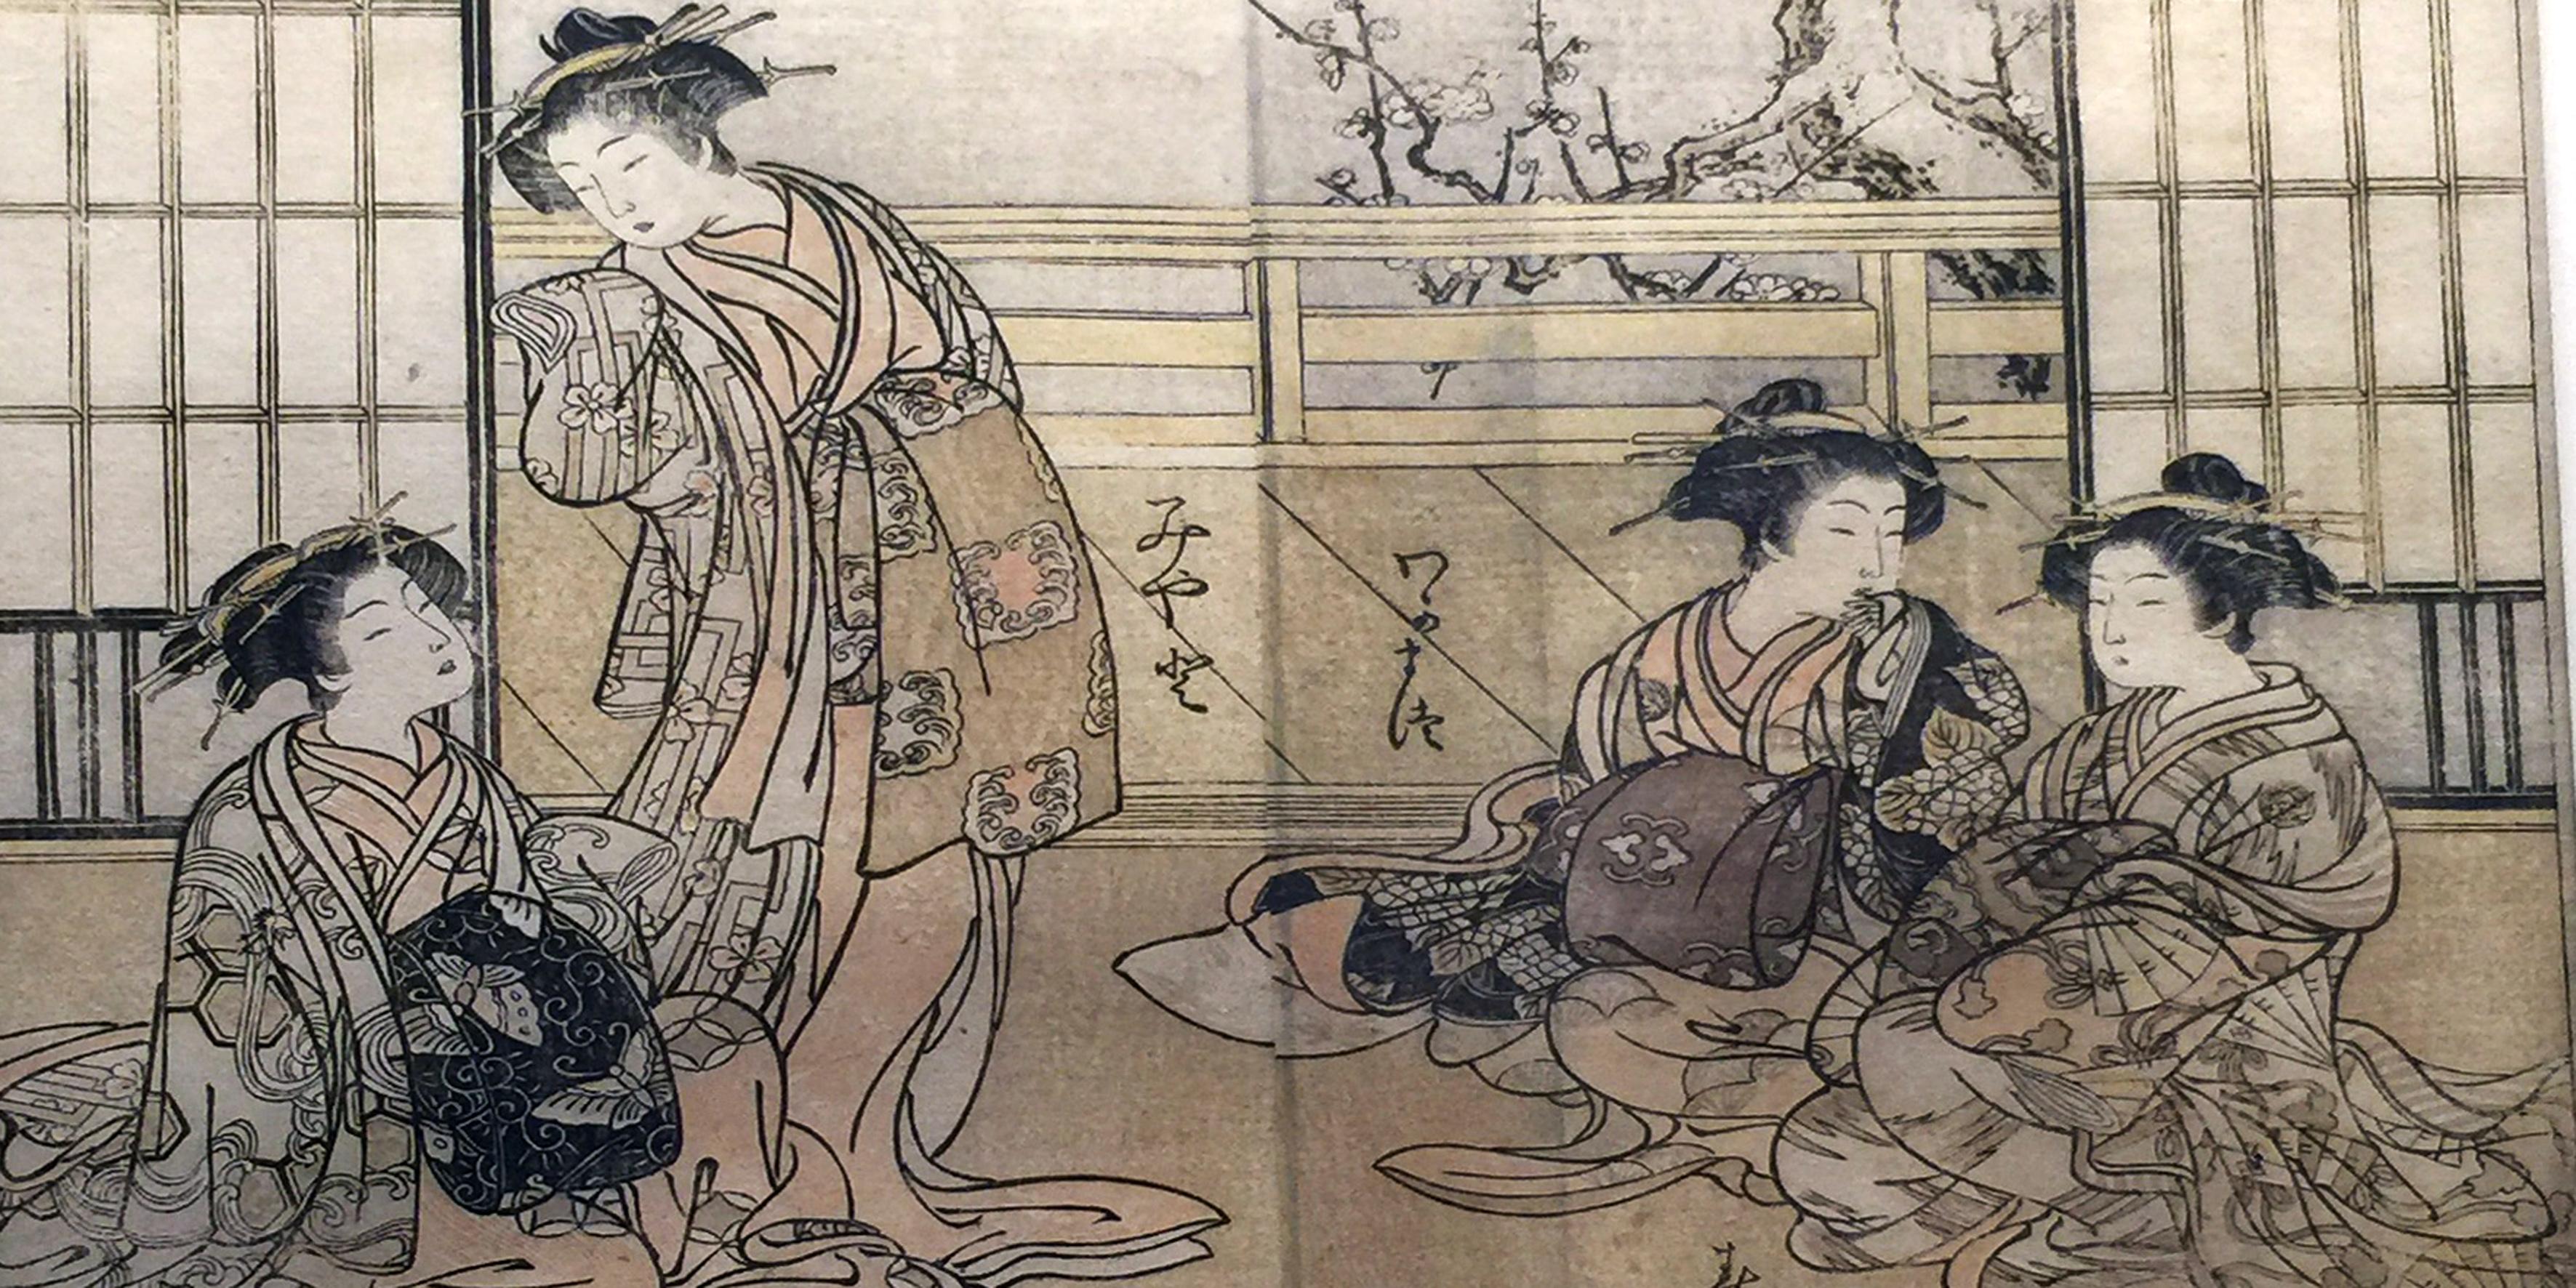 Donne a confronto nelle case da tè-1776- Xilografia policroma su carta da gelso-Shigemasa Kitao e Shunsho Katsushika-Arte giapponese